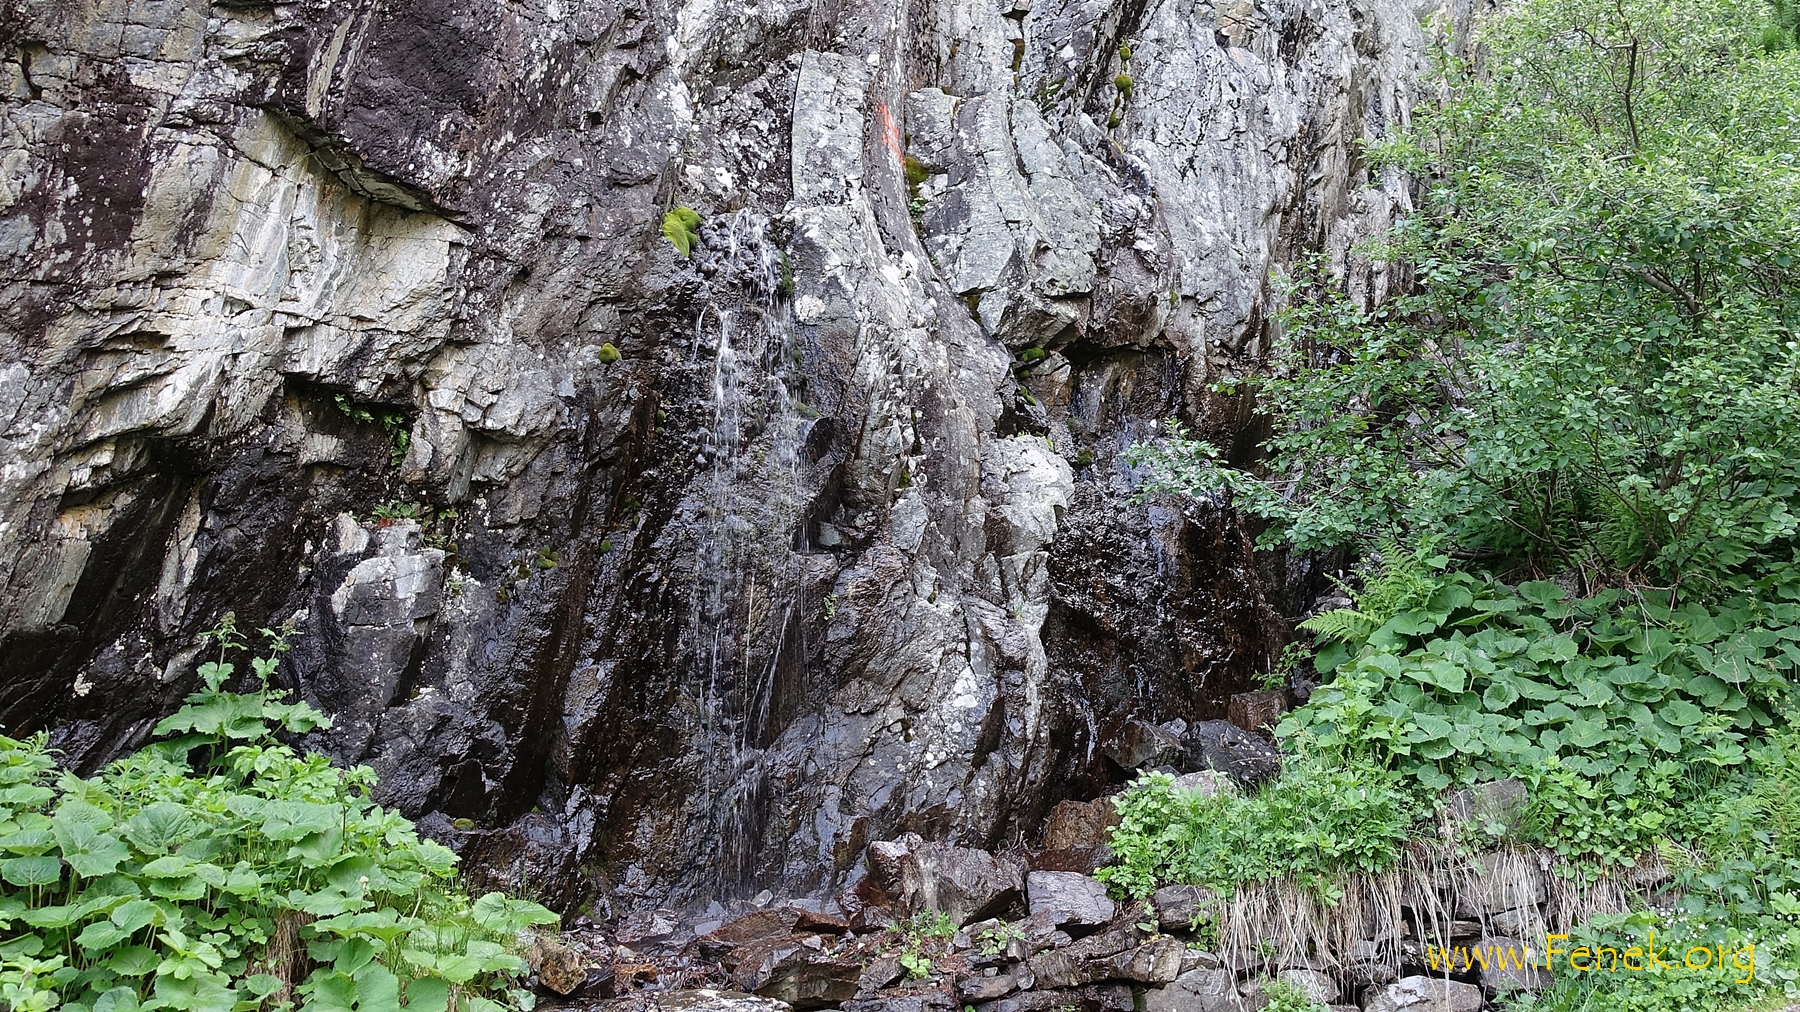 """Moses Quelle"" - das Wasser entspringt aus dem Felsen"